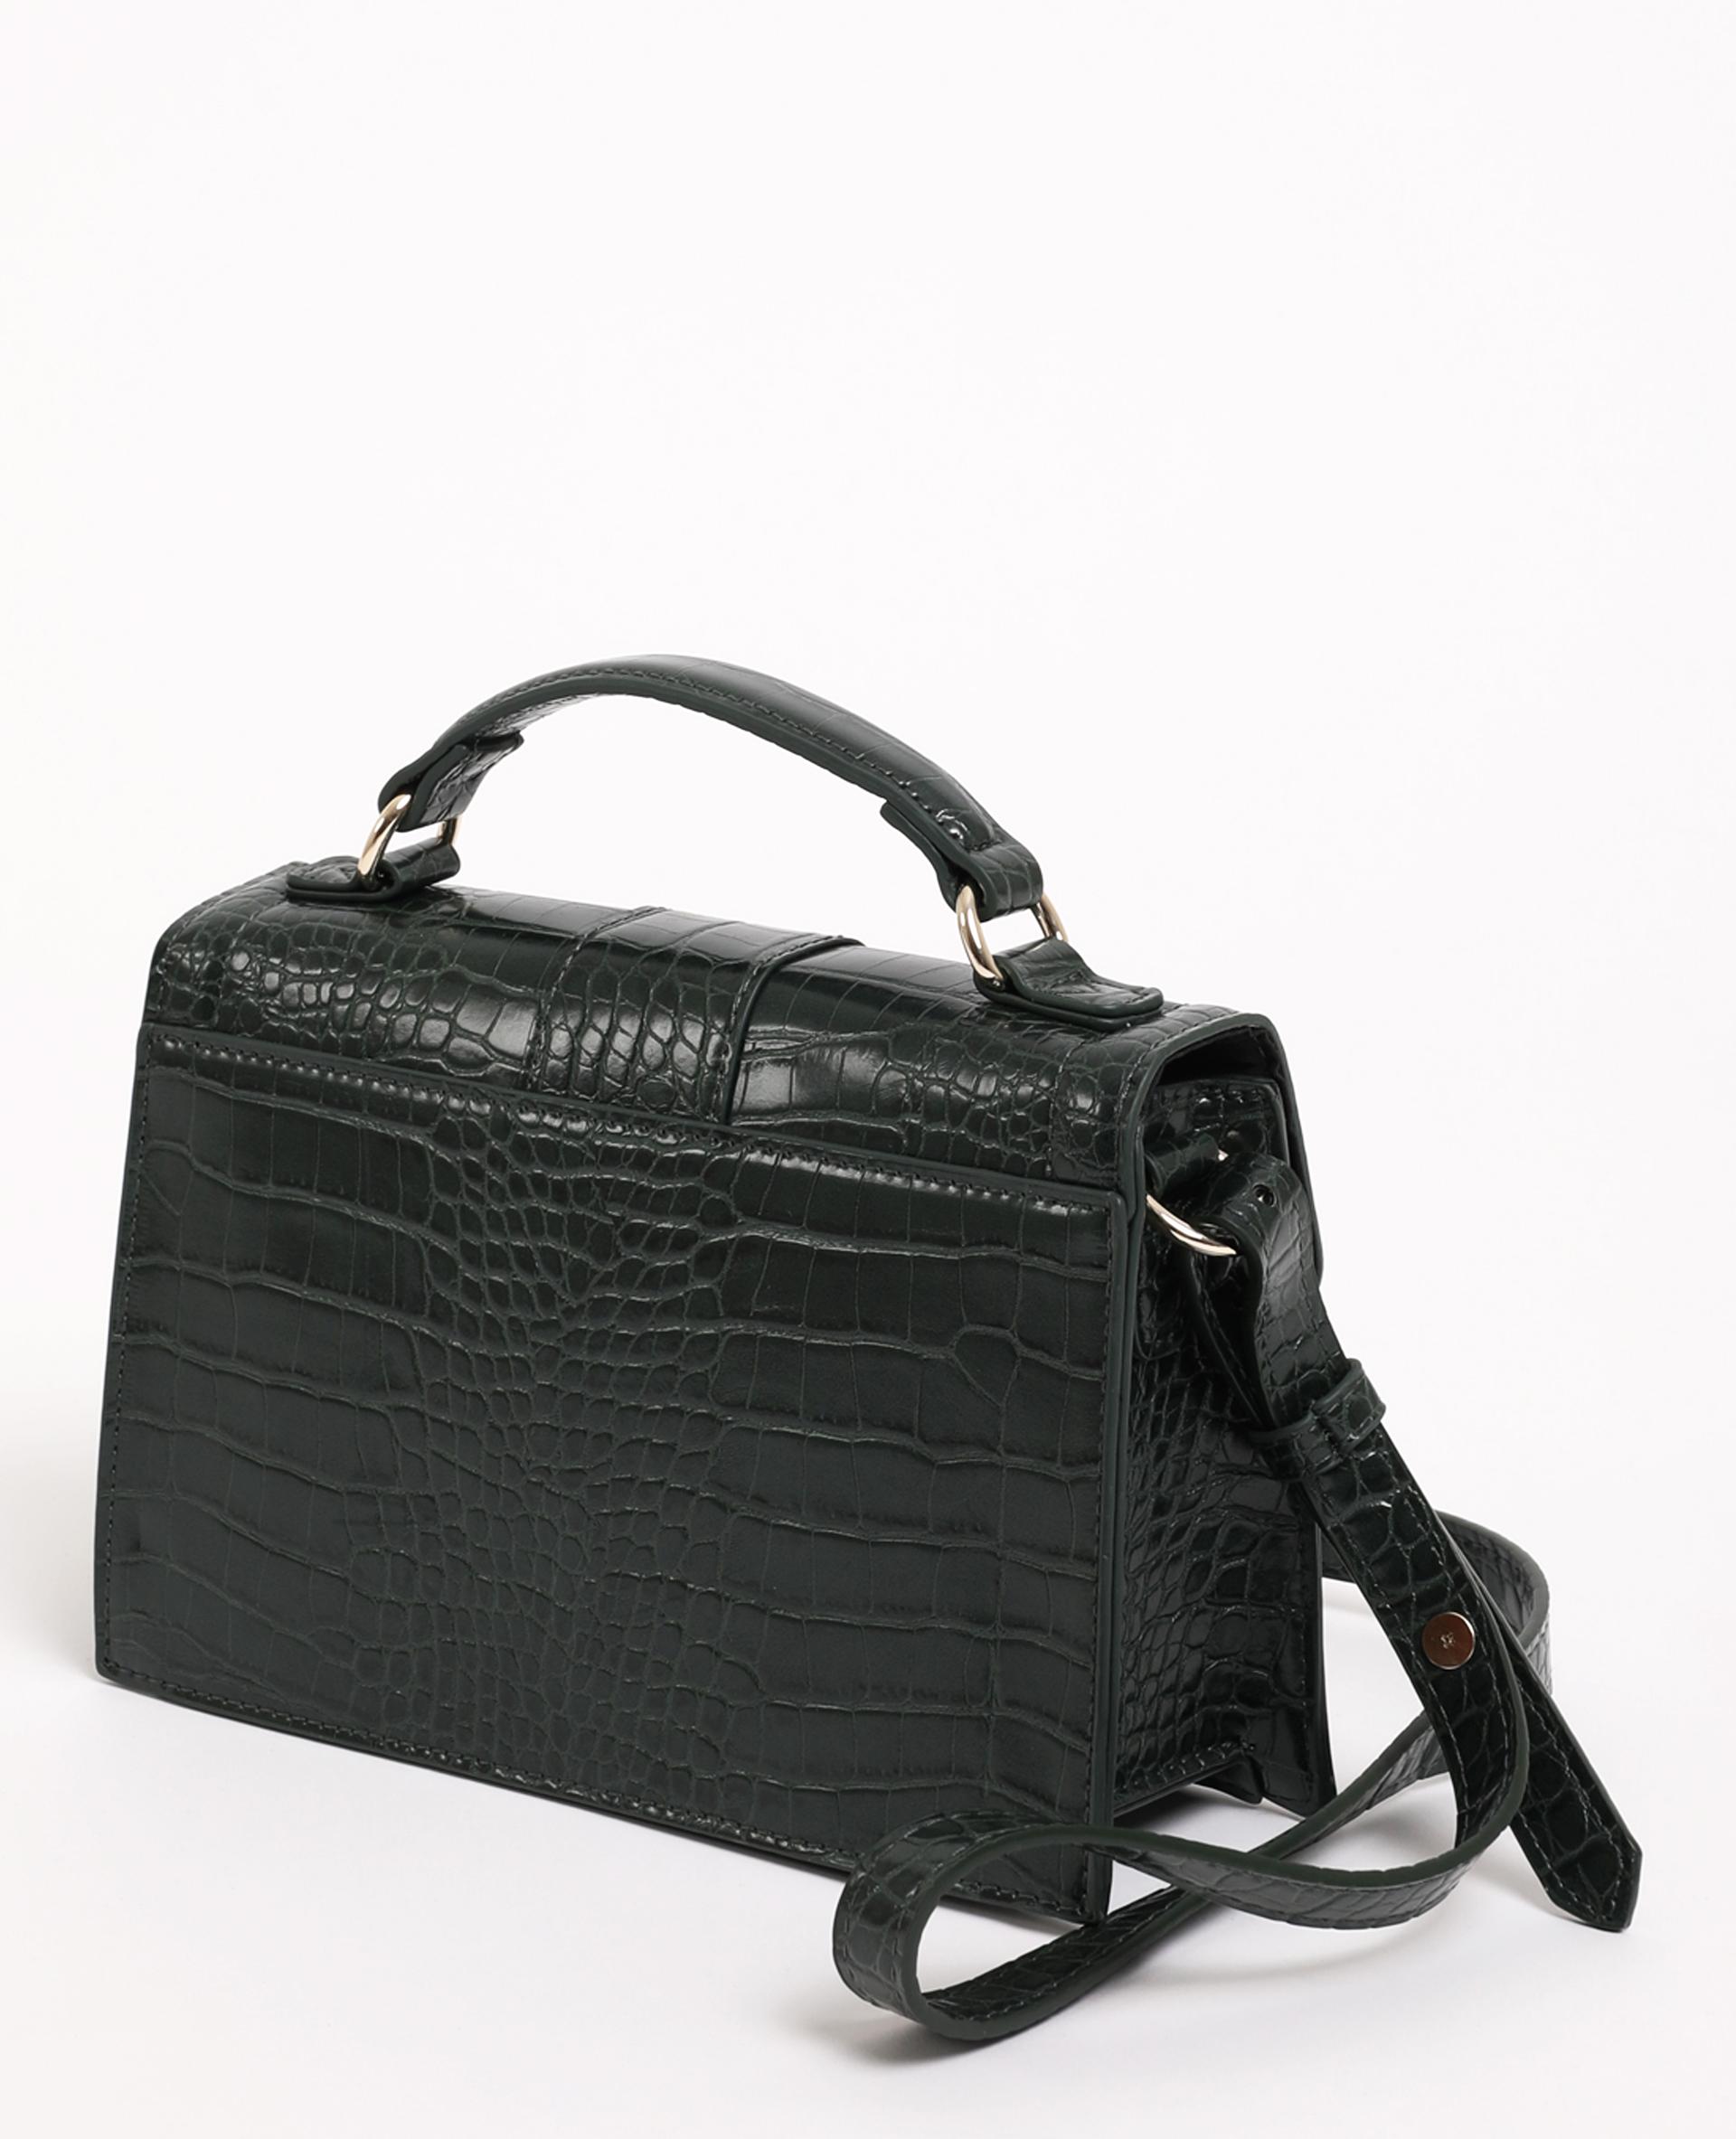 Borsa boxy valigetta verde acqua - Pimkie